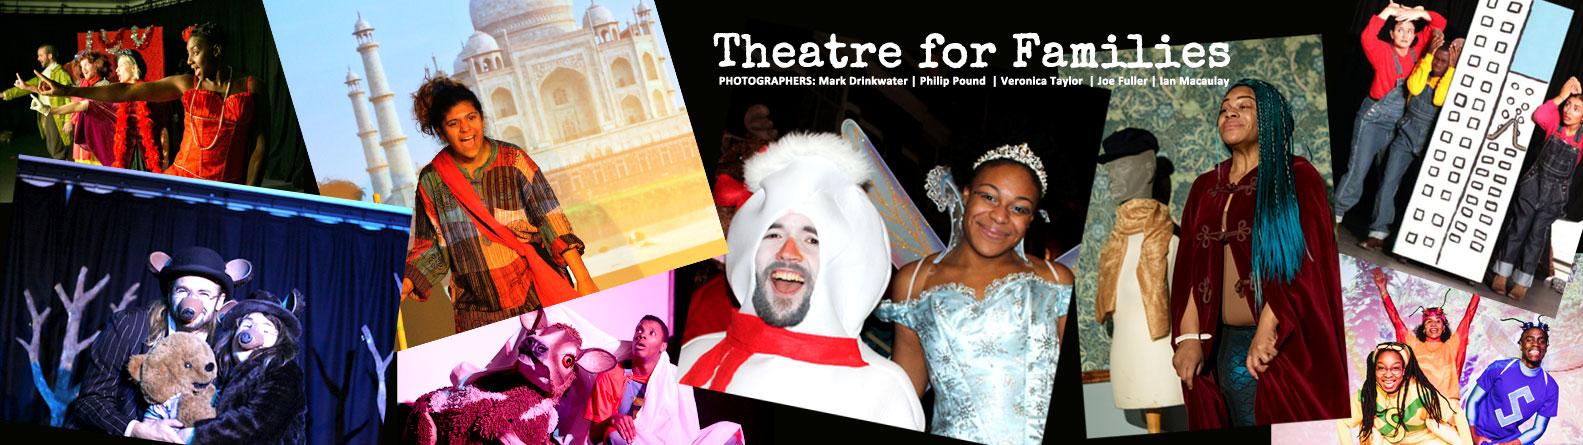 theatre for families Sydenham SE26